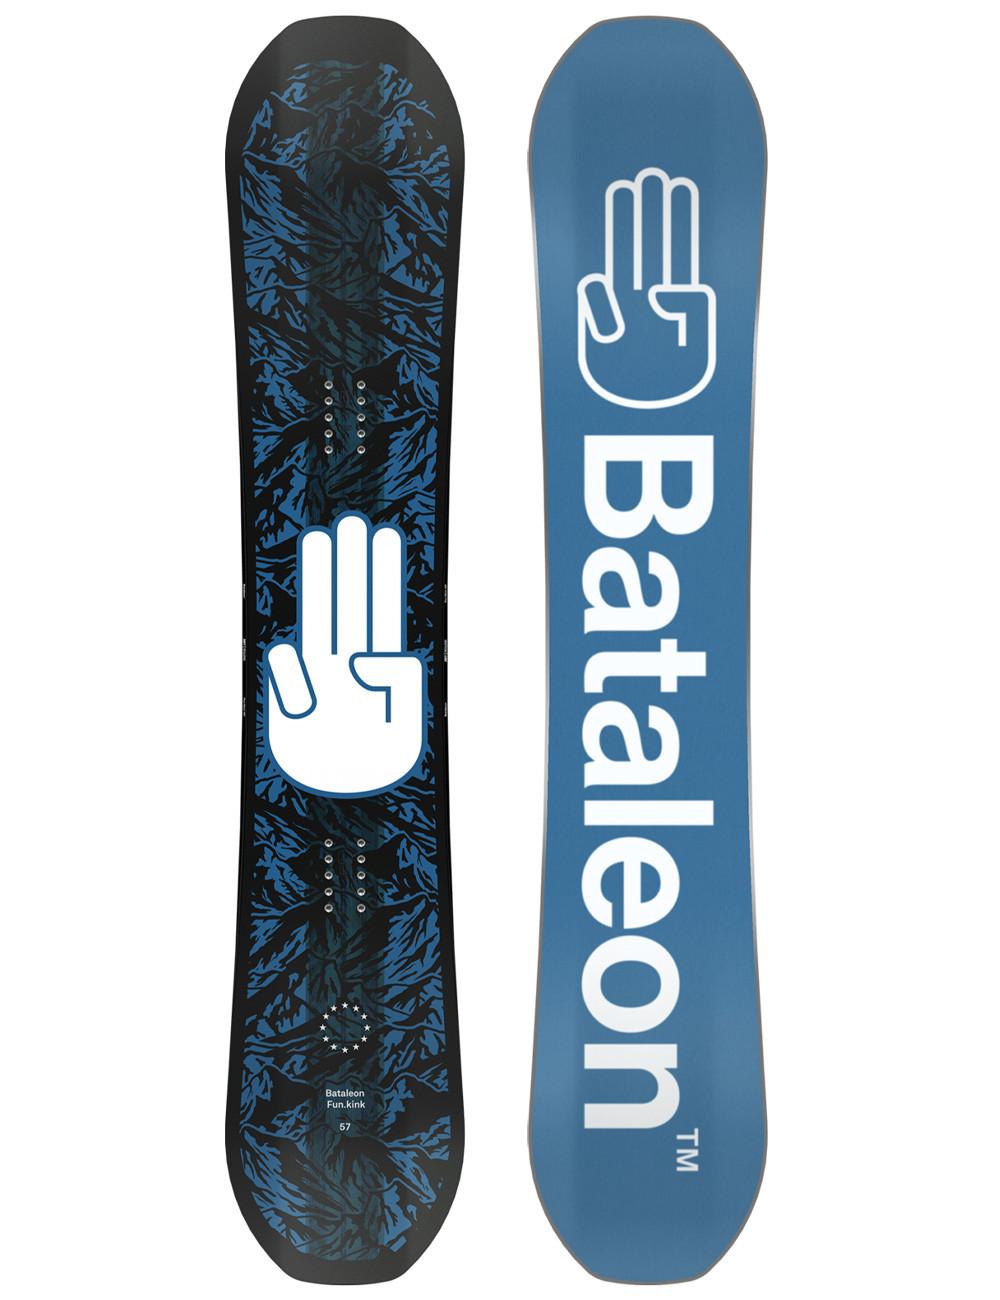 Deska snowboardowa Bataleon Fun.Kink Wide